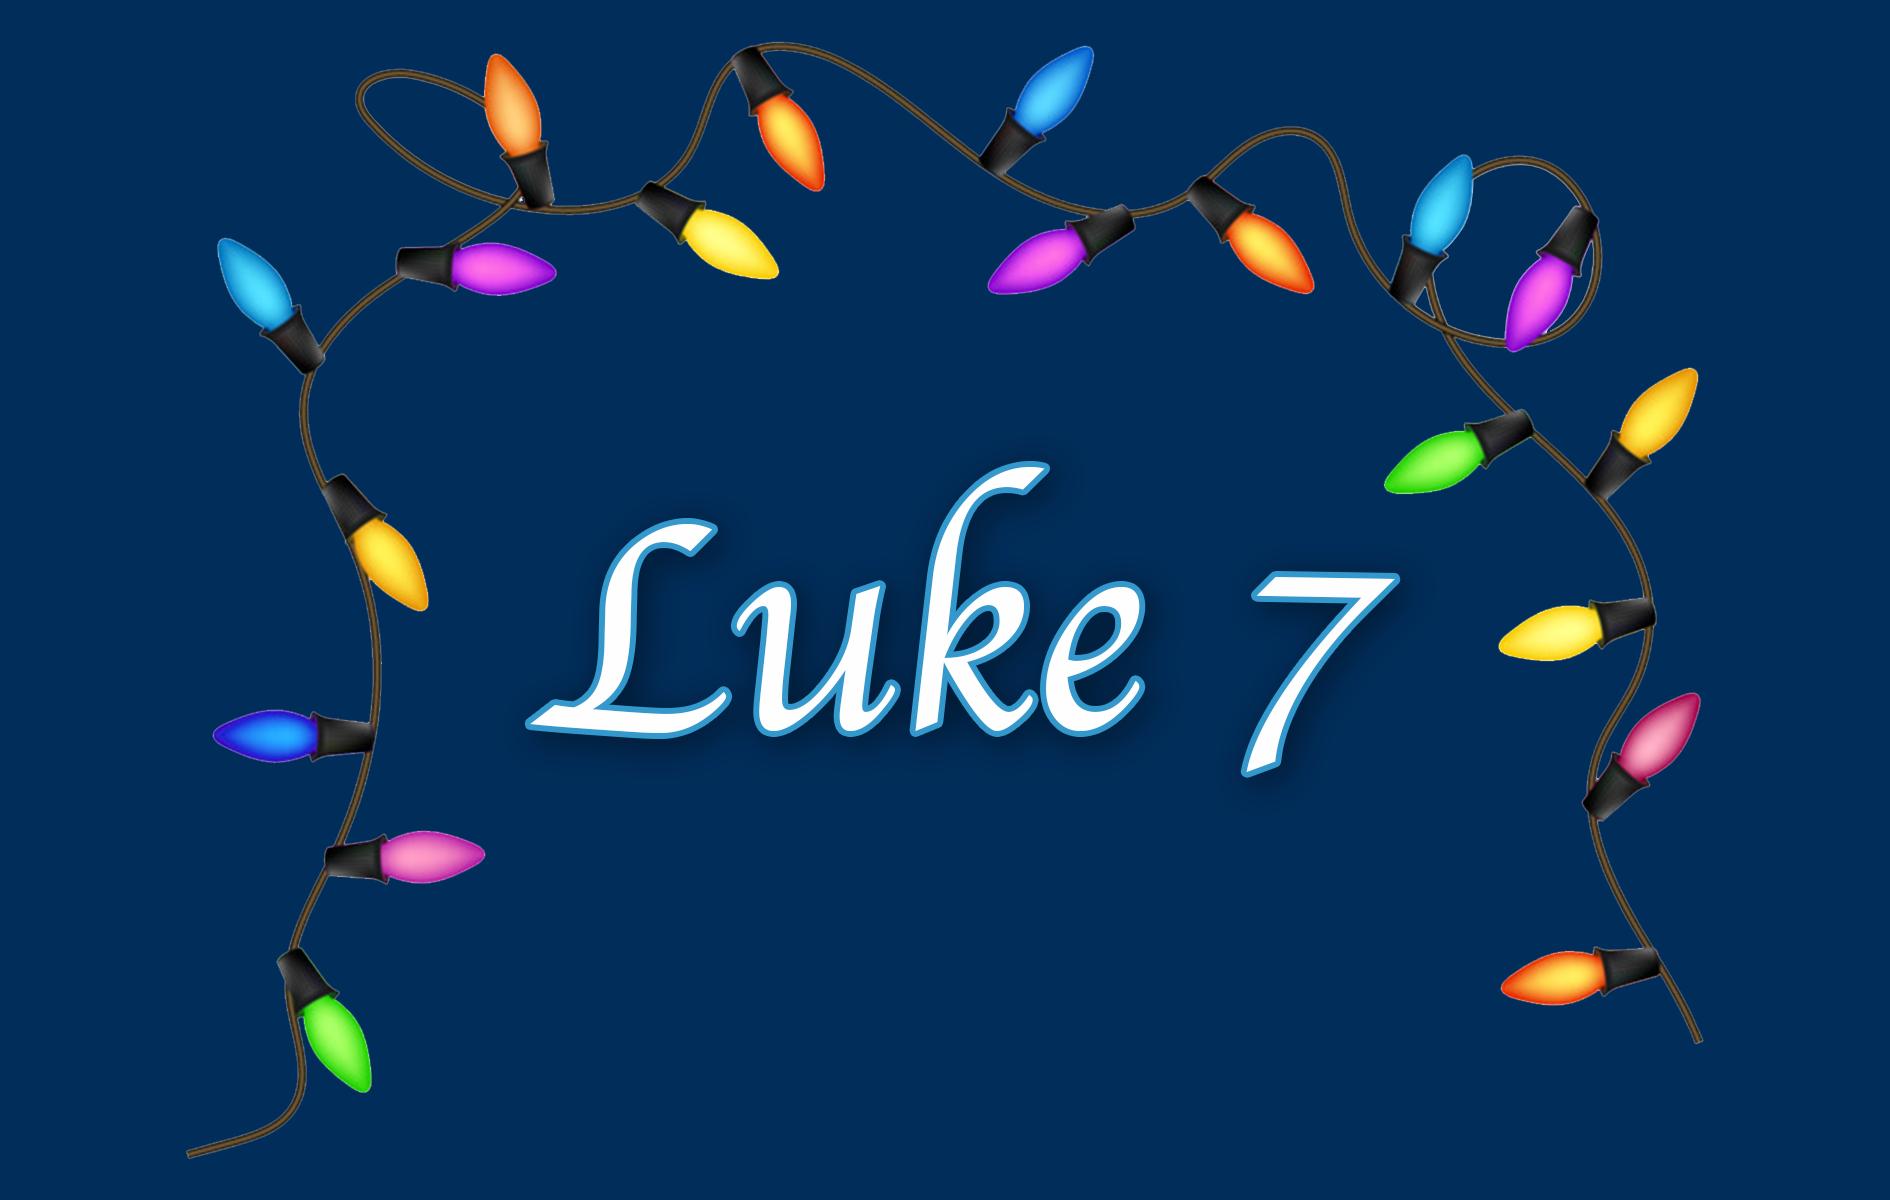 Julemysteriet – del 7